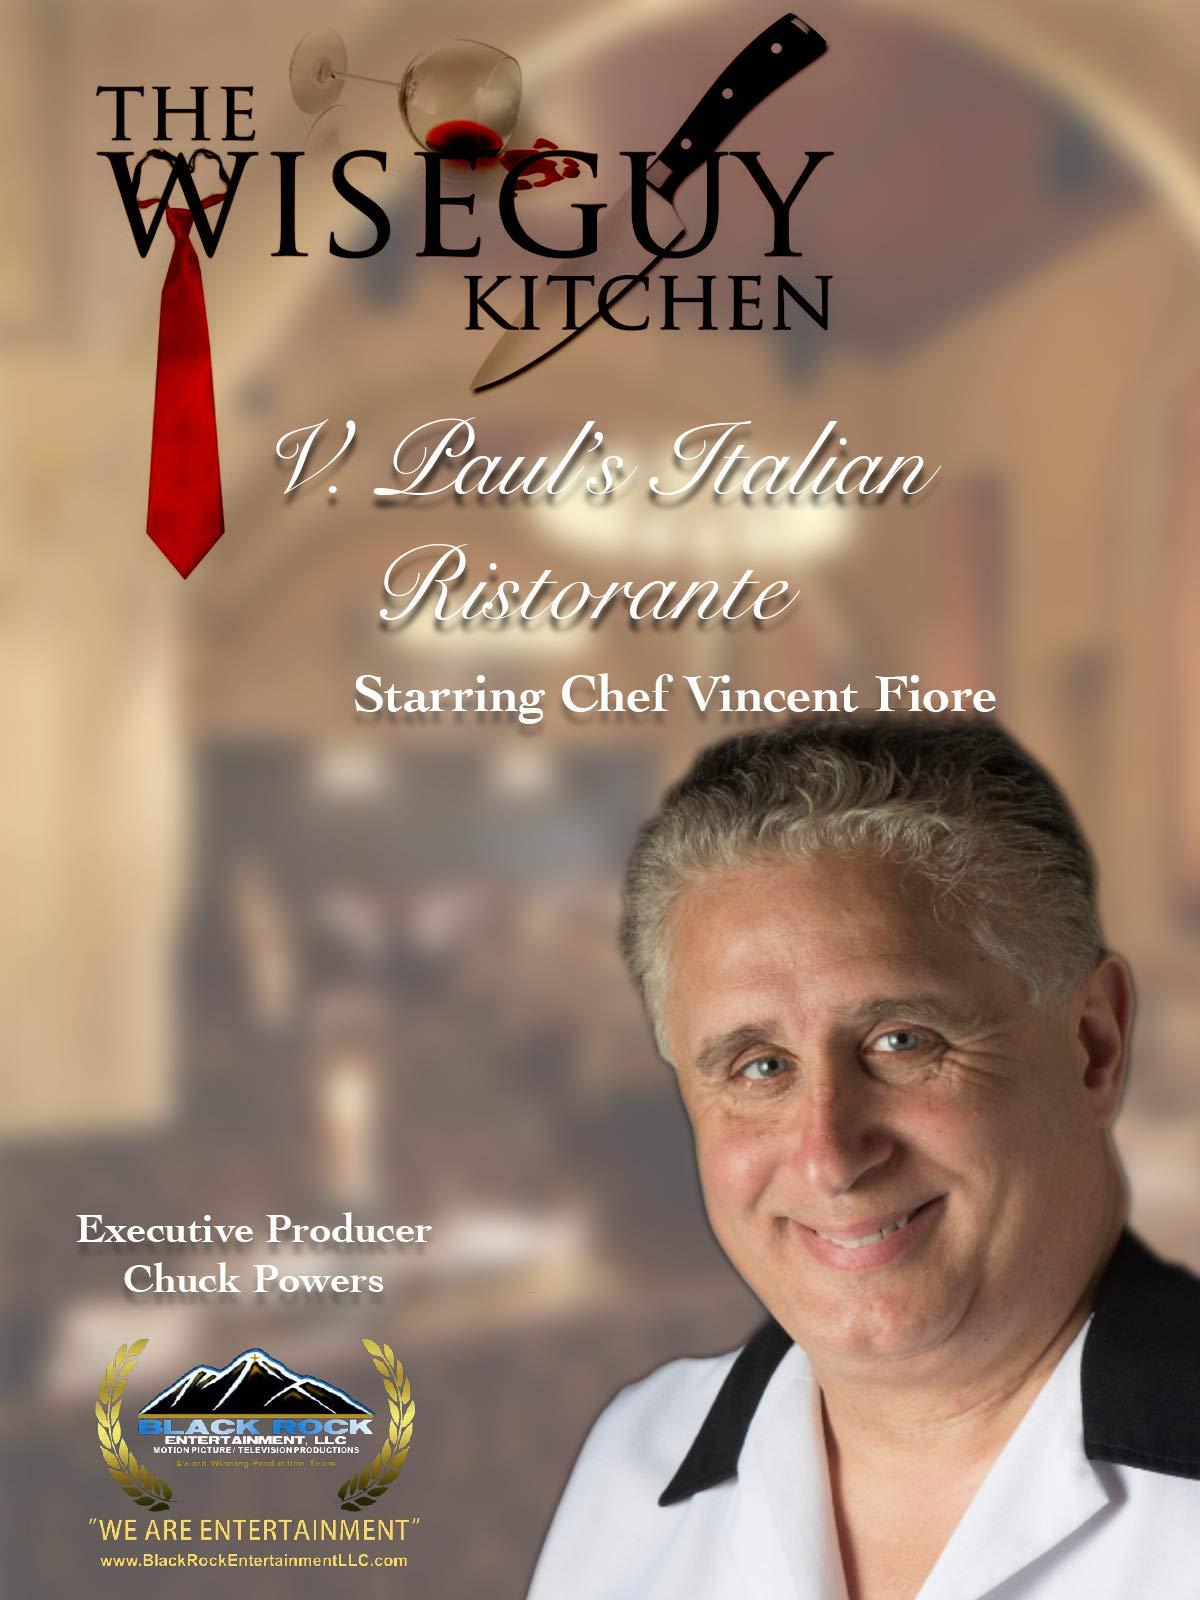 The Wiseguy Kitchen Show: V. Paul's Italian Ristorante